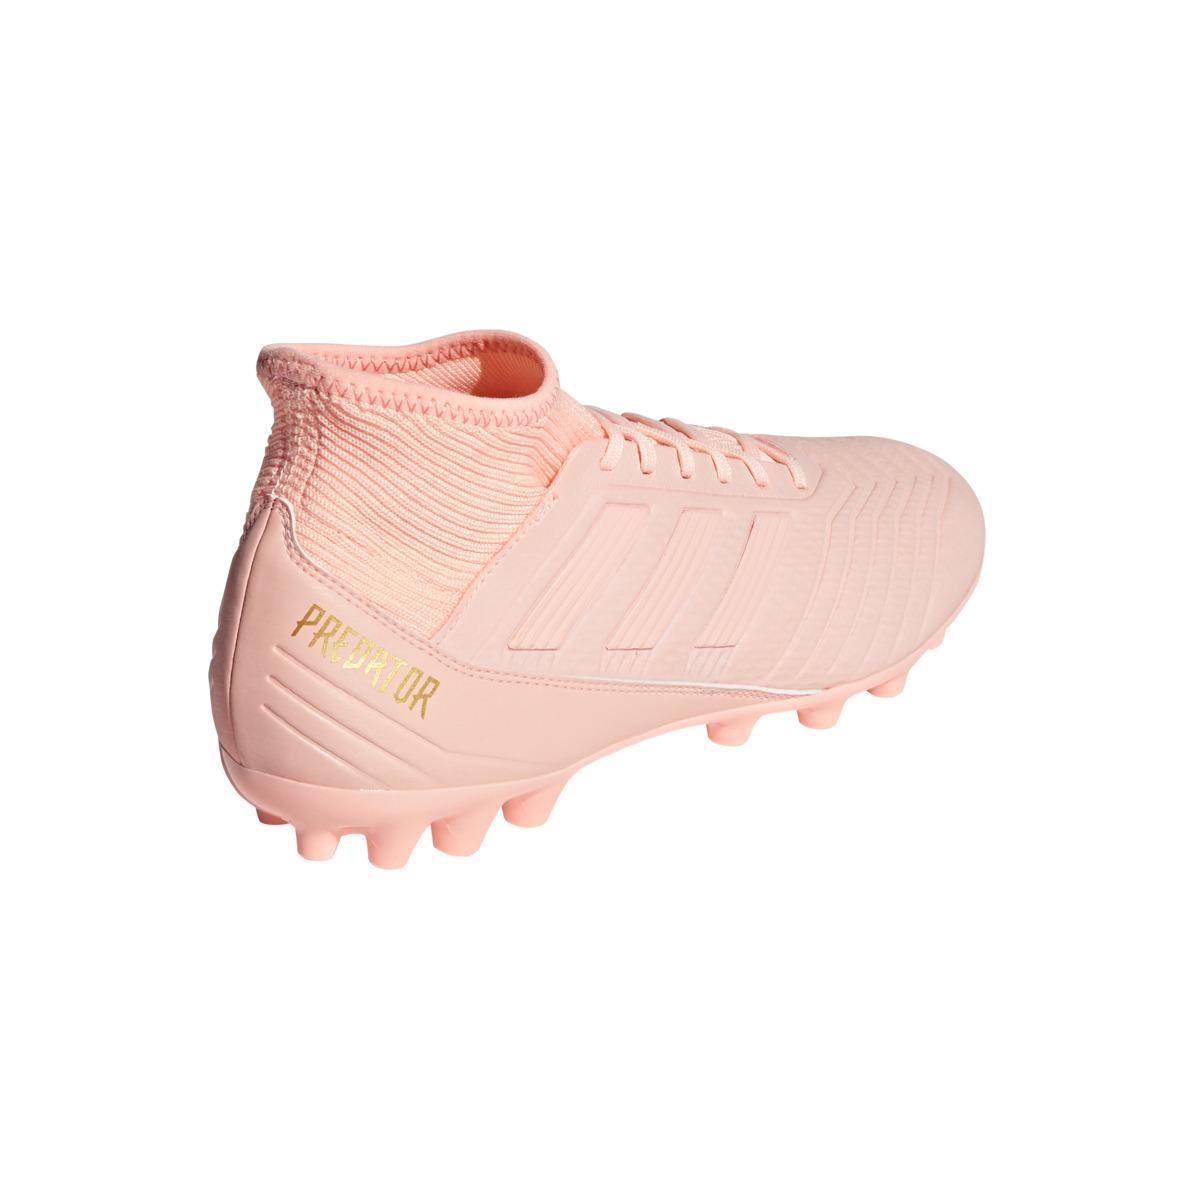 predator football boots discount